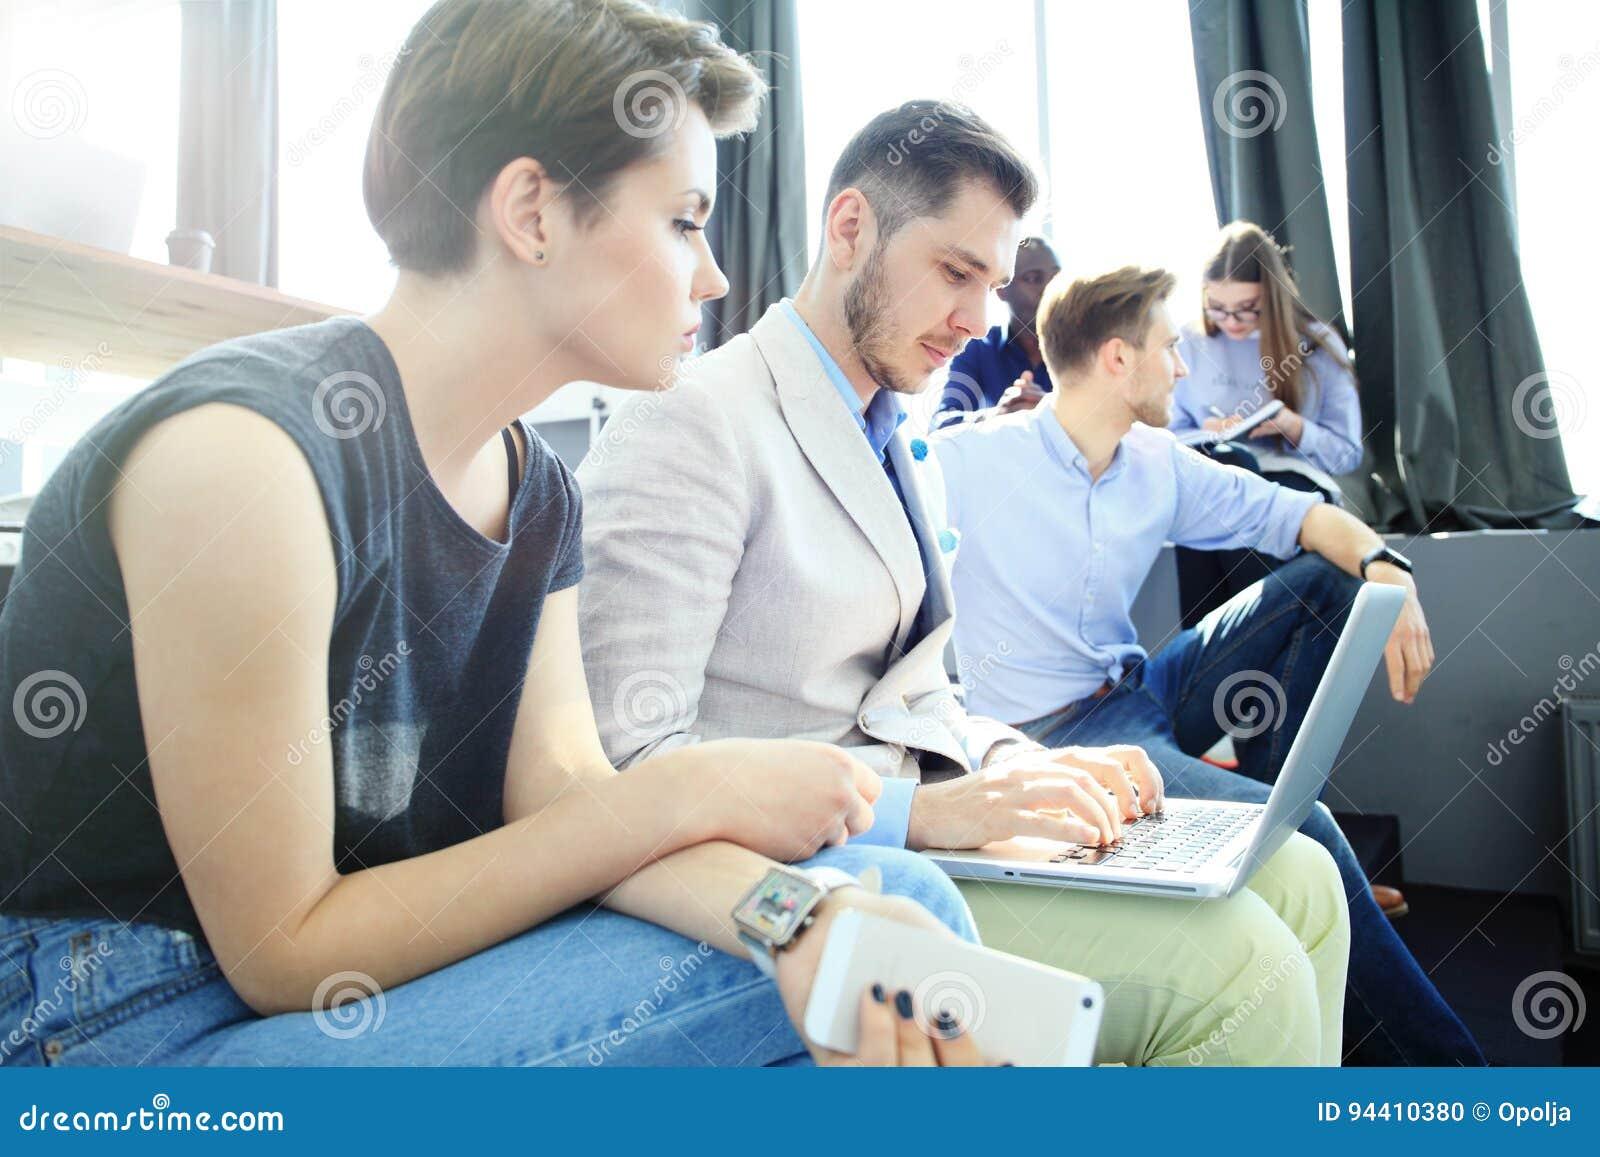 Startup Diversity Teamwork Brainstorming Meeting Concept.Business Team Coworkers Analyze Finance Report Laptop.People